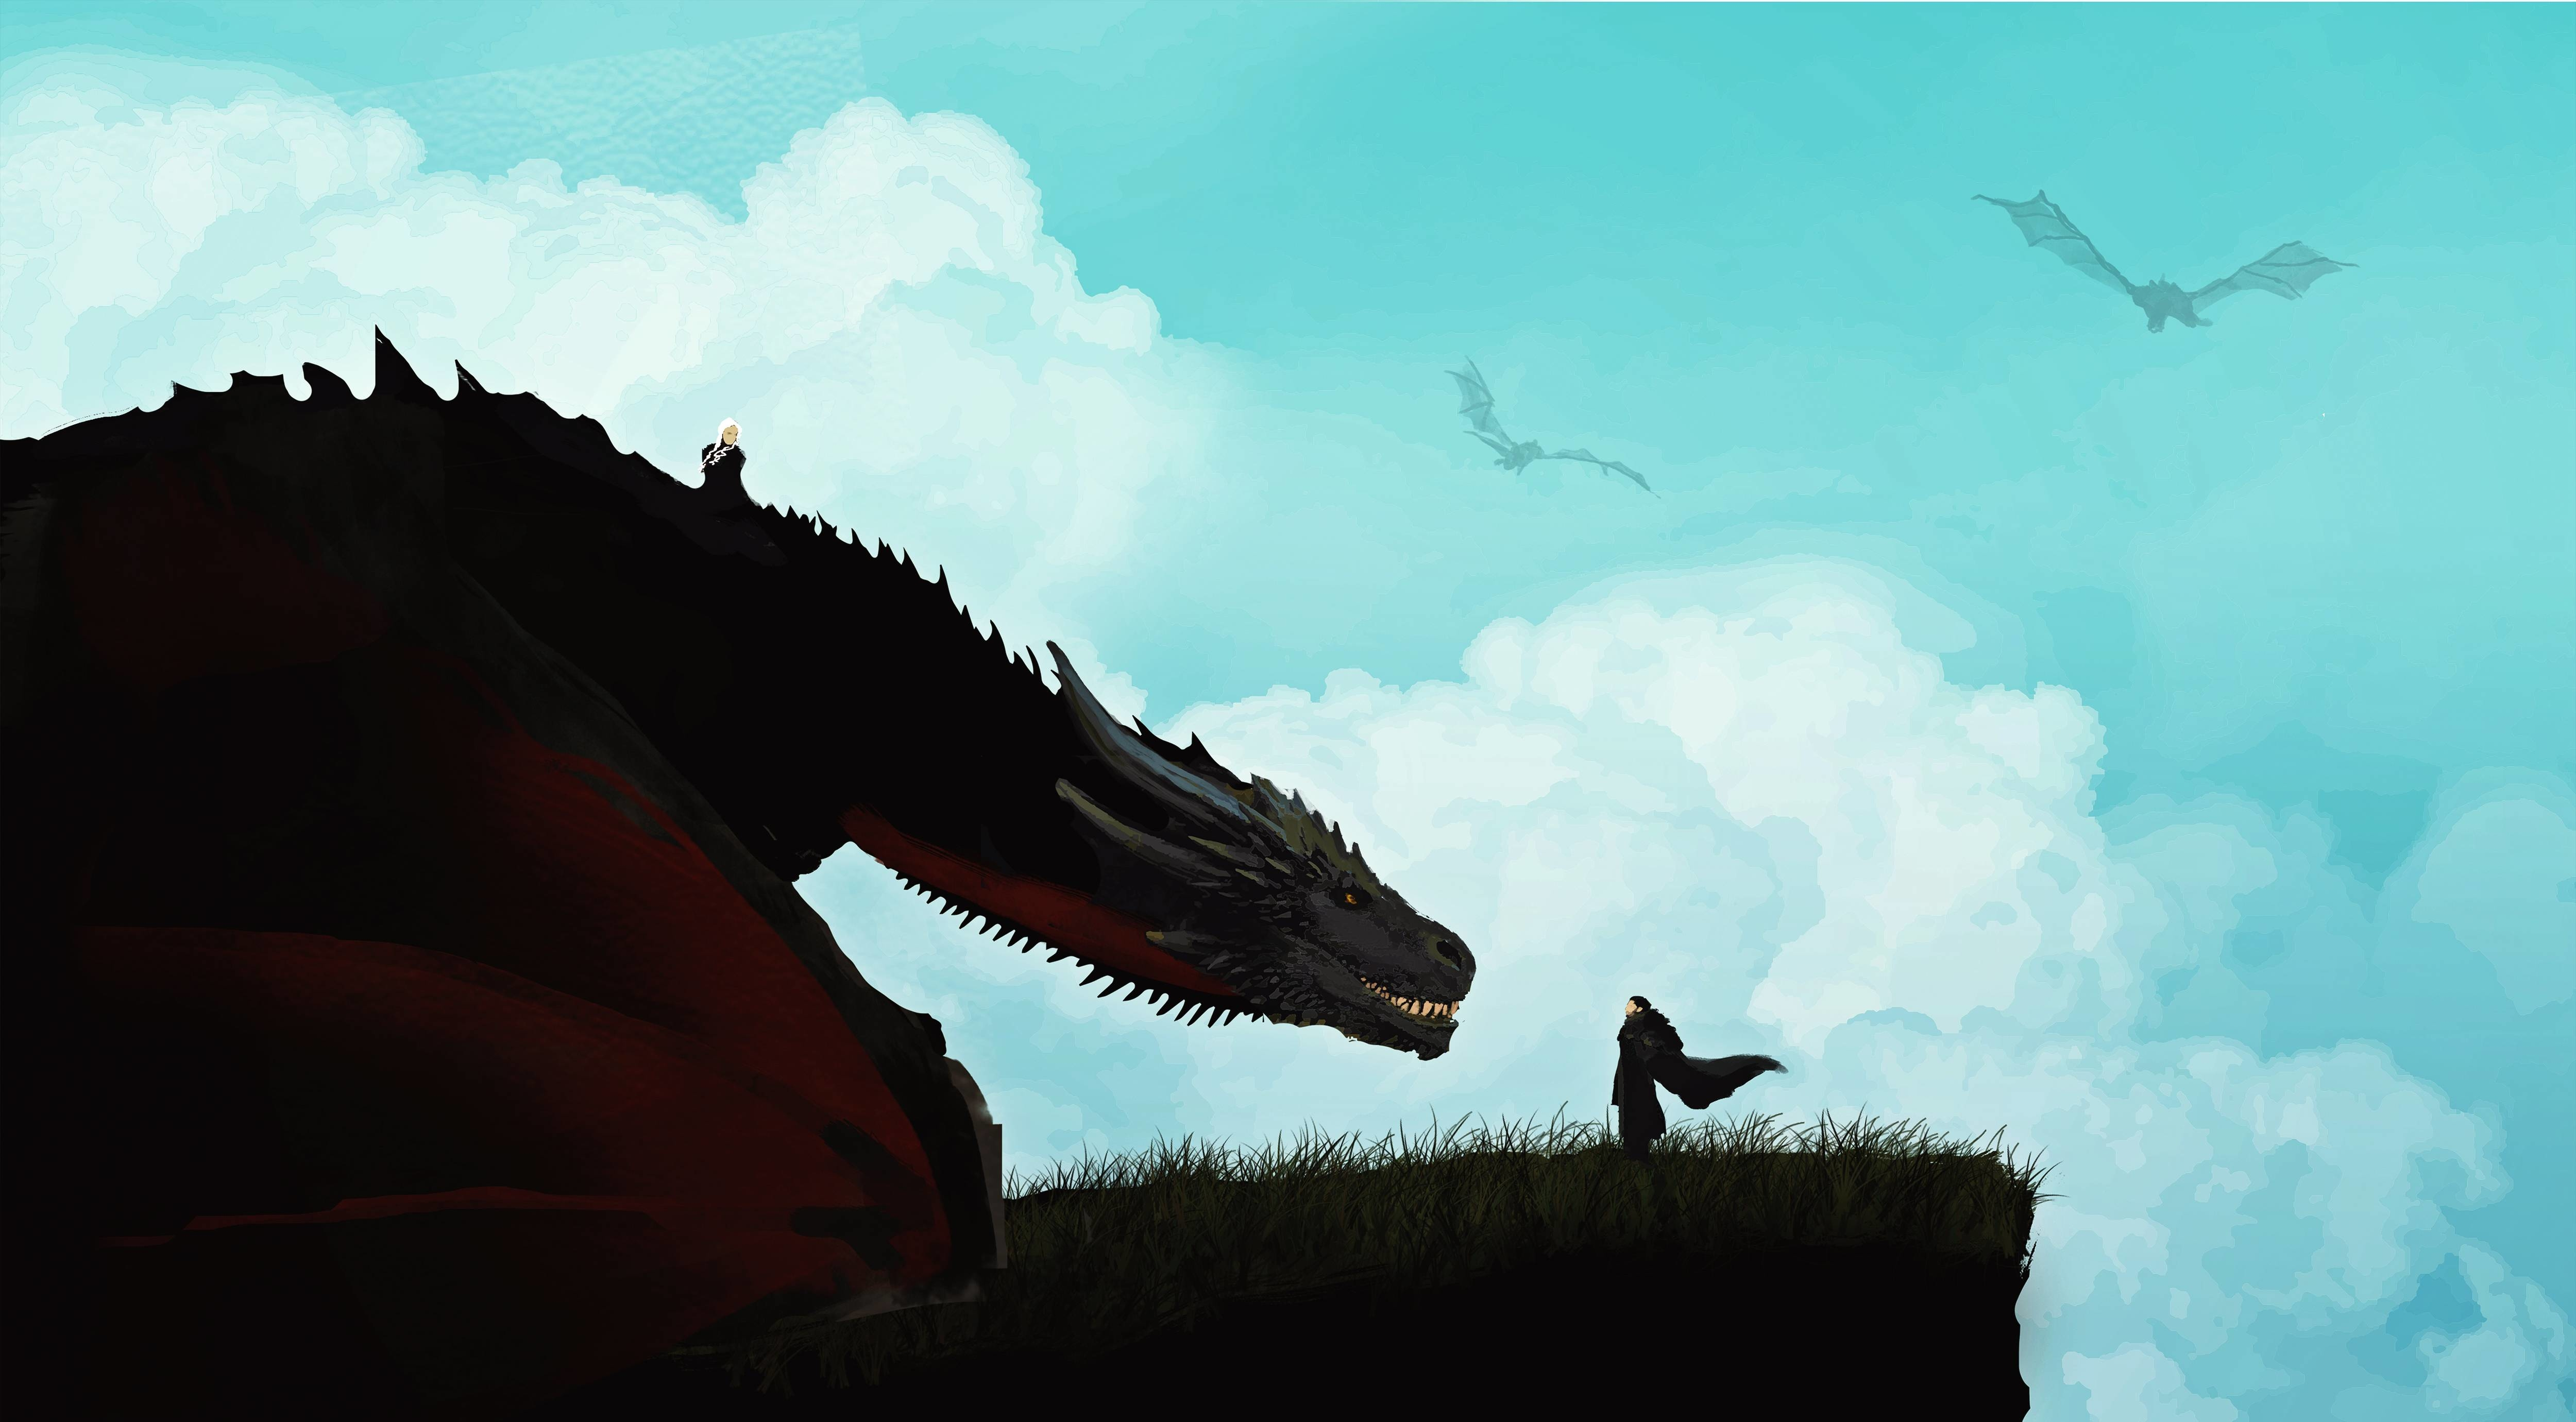 Game Of Thrones Wallpaper 4k For Pc - Game Of Thrones Hd Desktop - HD Wallpaper